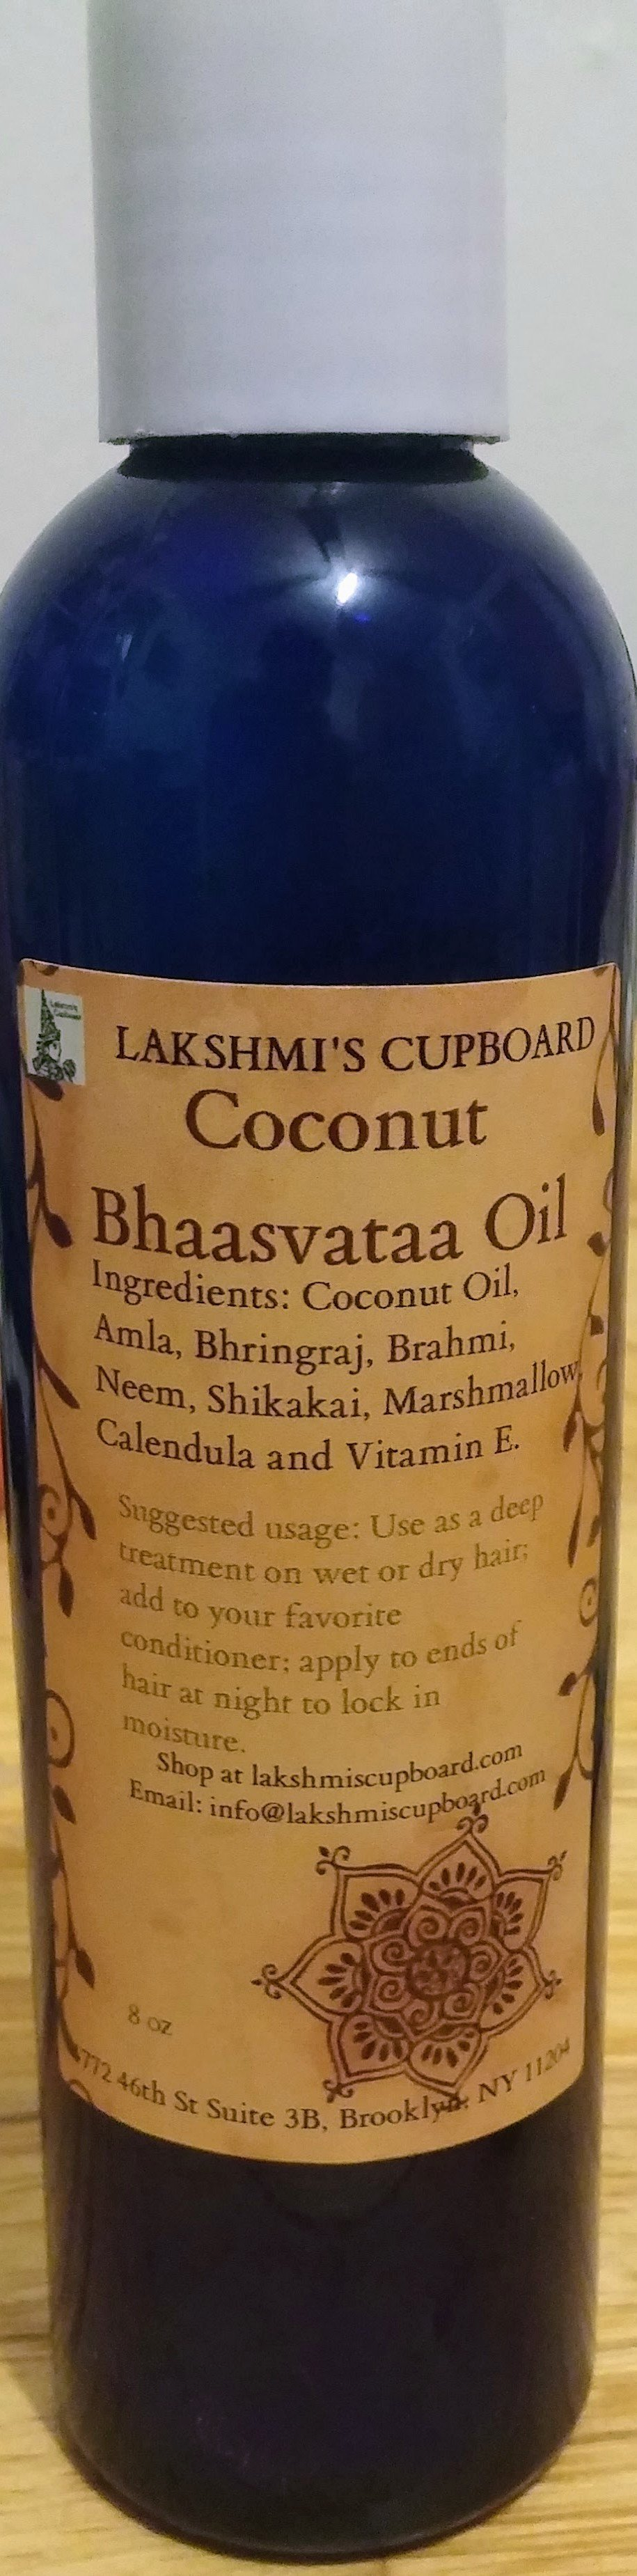 Bhaasvataa Coconut Oil w/ Amla, Shikakai, Neem Bhringraj, Calendula, Marshmallow and Brahmi 8 oz 00033